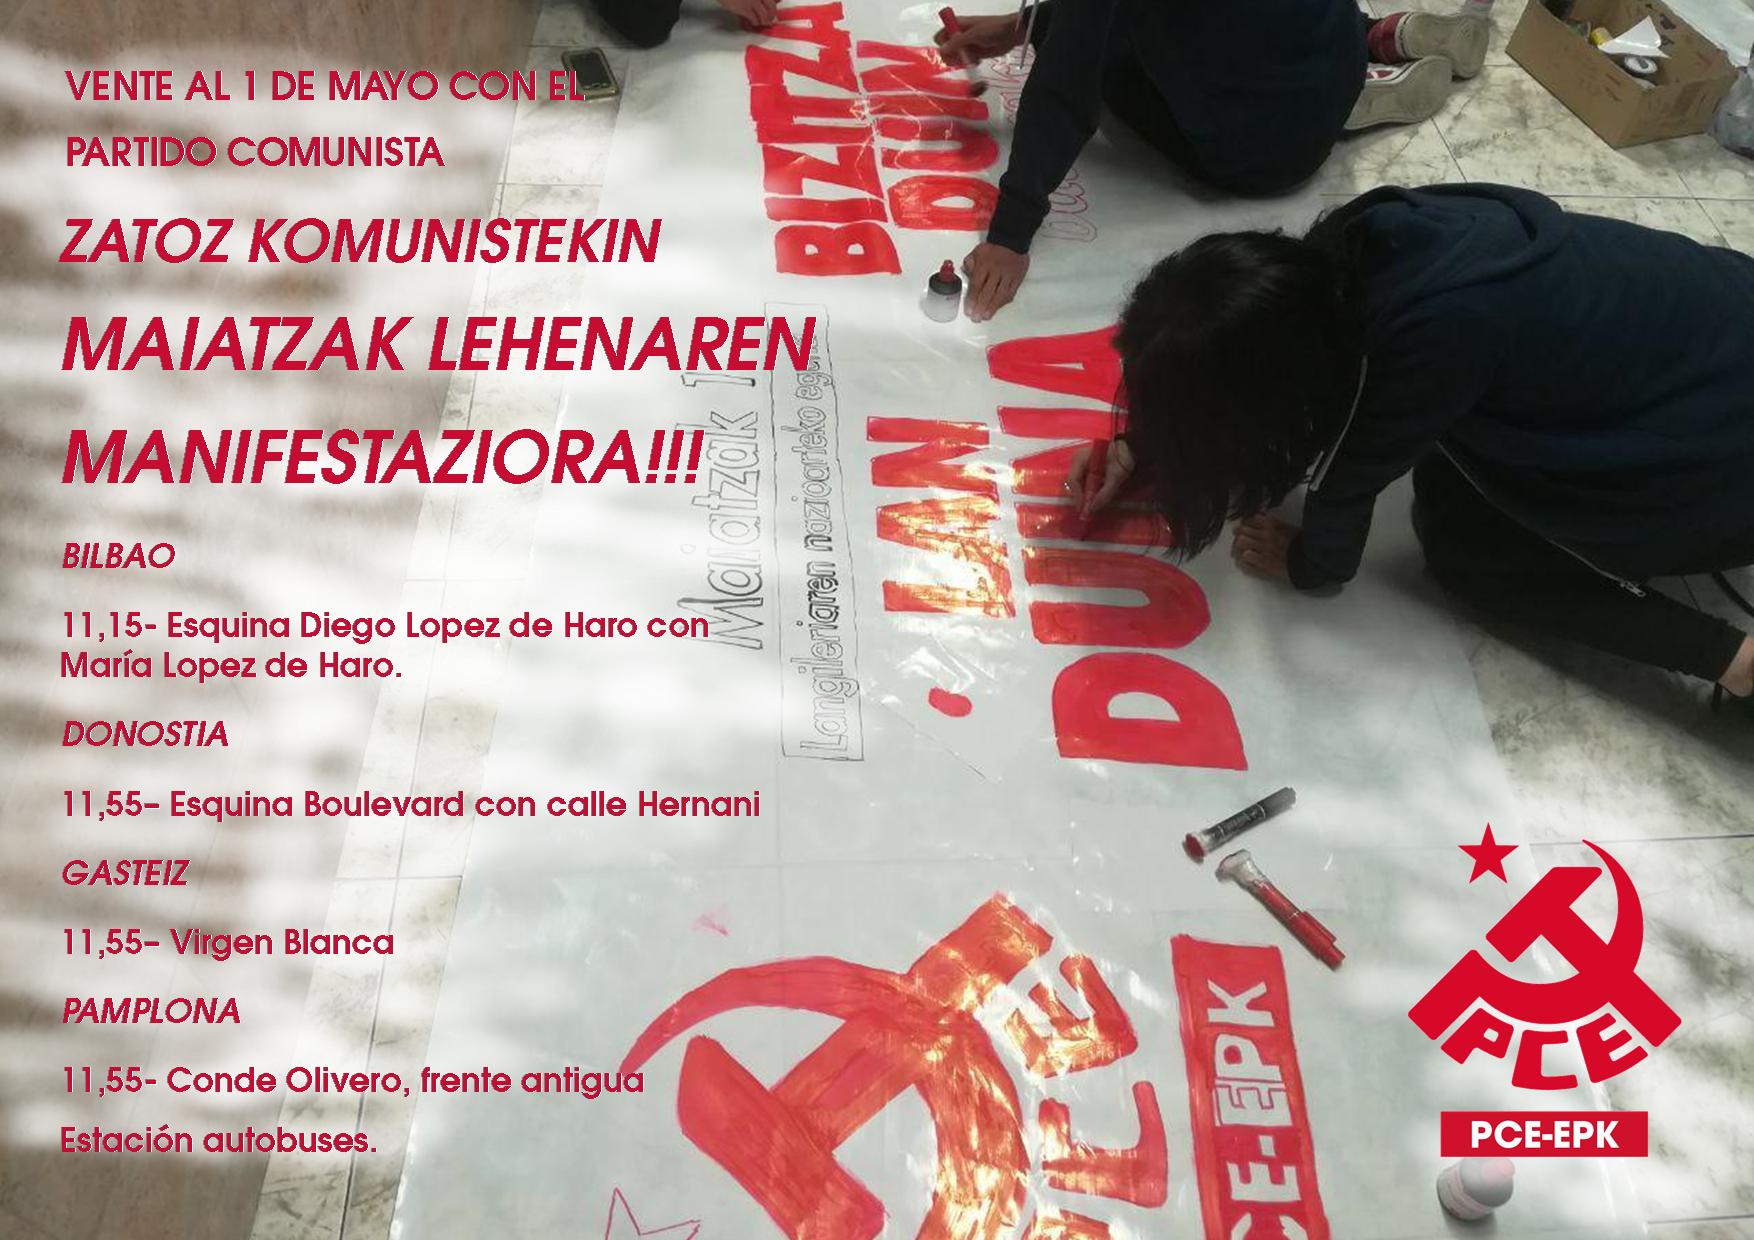 ZATOZ KOMUNISTEKIN MAIATZAK LEHENAREN MANIFESTAZIORA!!!  VENTE CON LAS COMUNISTAS AL 1º DE MAYO